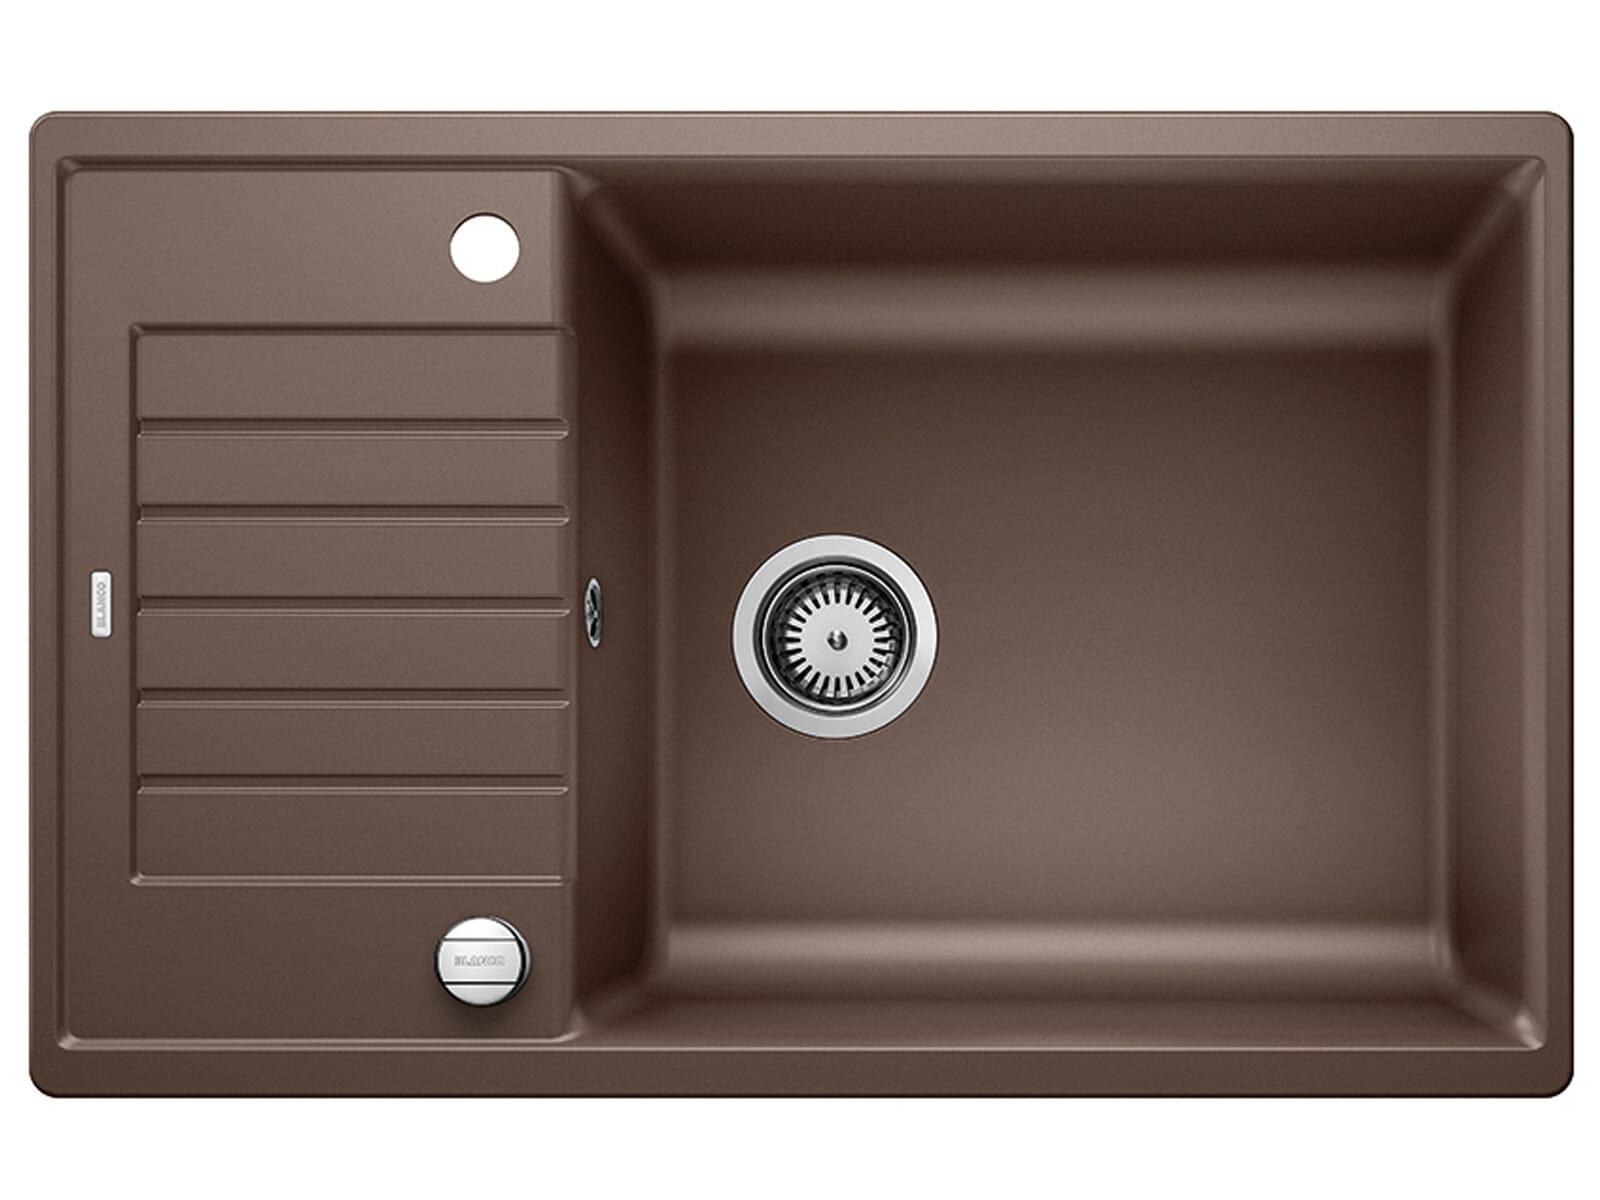 Blanco Zia XL 6 S Compact Cafe - 523 272 Granitspüle